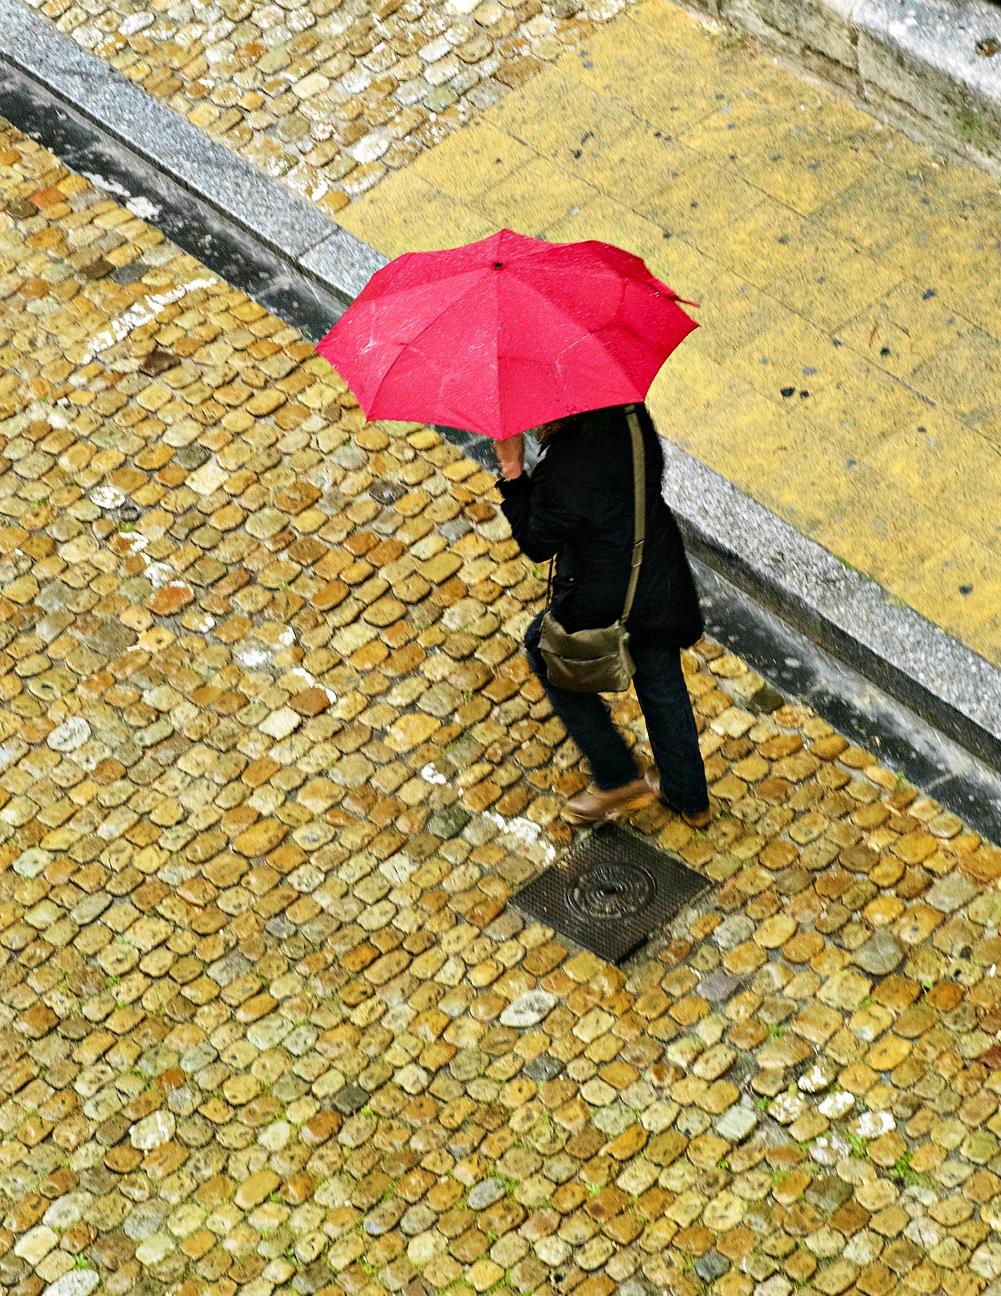 Raining in Venice by stngoldberg in Regular Member Gallery